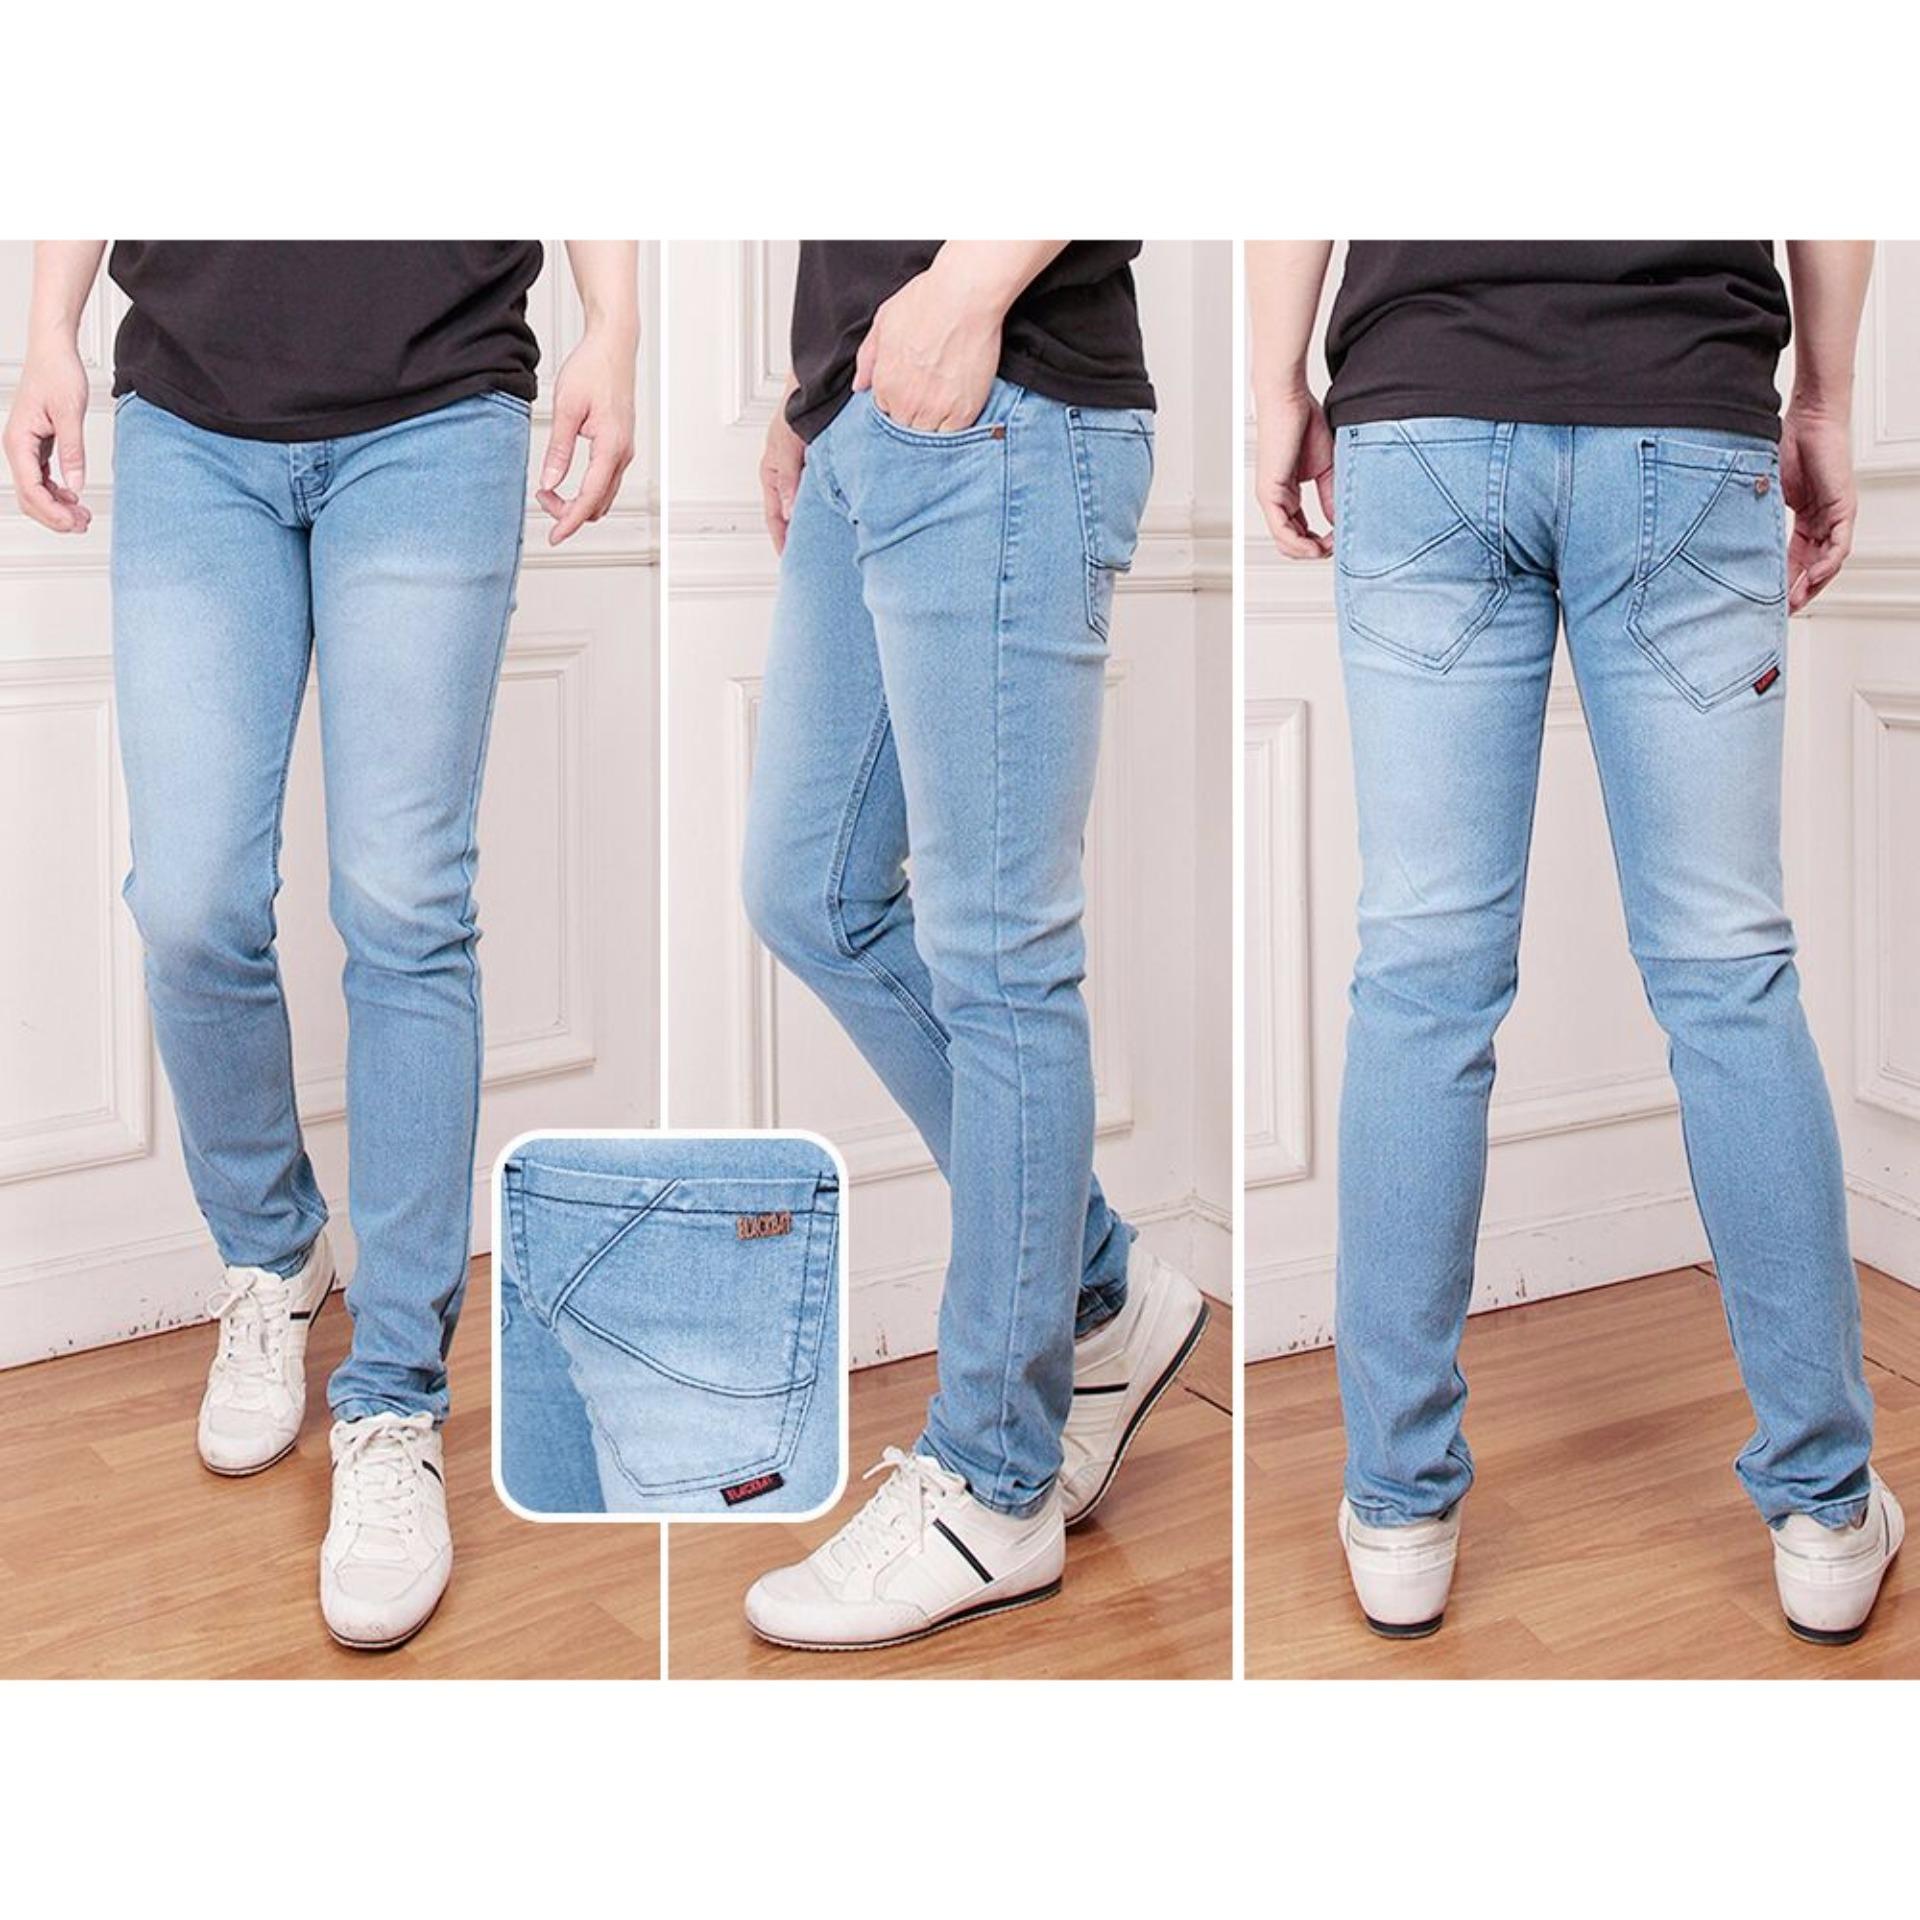 Flash Sale Nj Celana Jeans Denim Slim Fit Pria Bio Bliz Price Blackfield Ripped Hitam